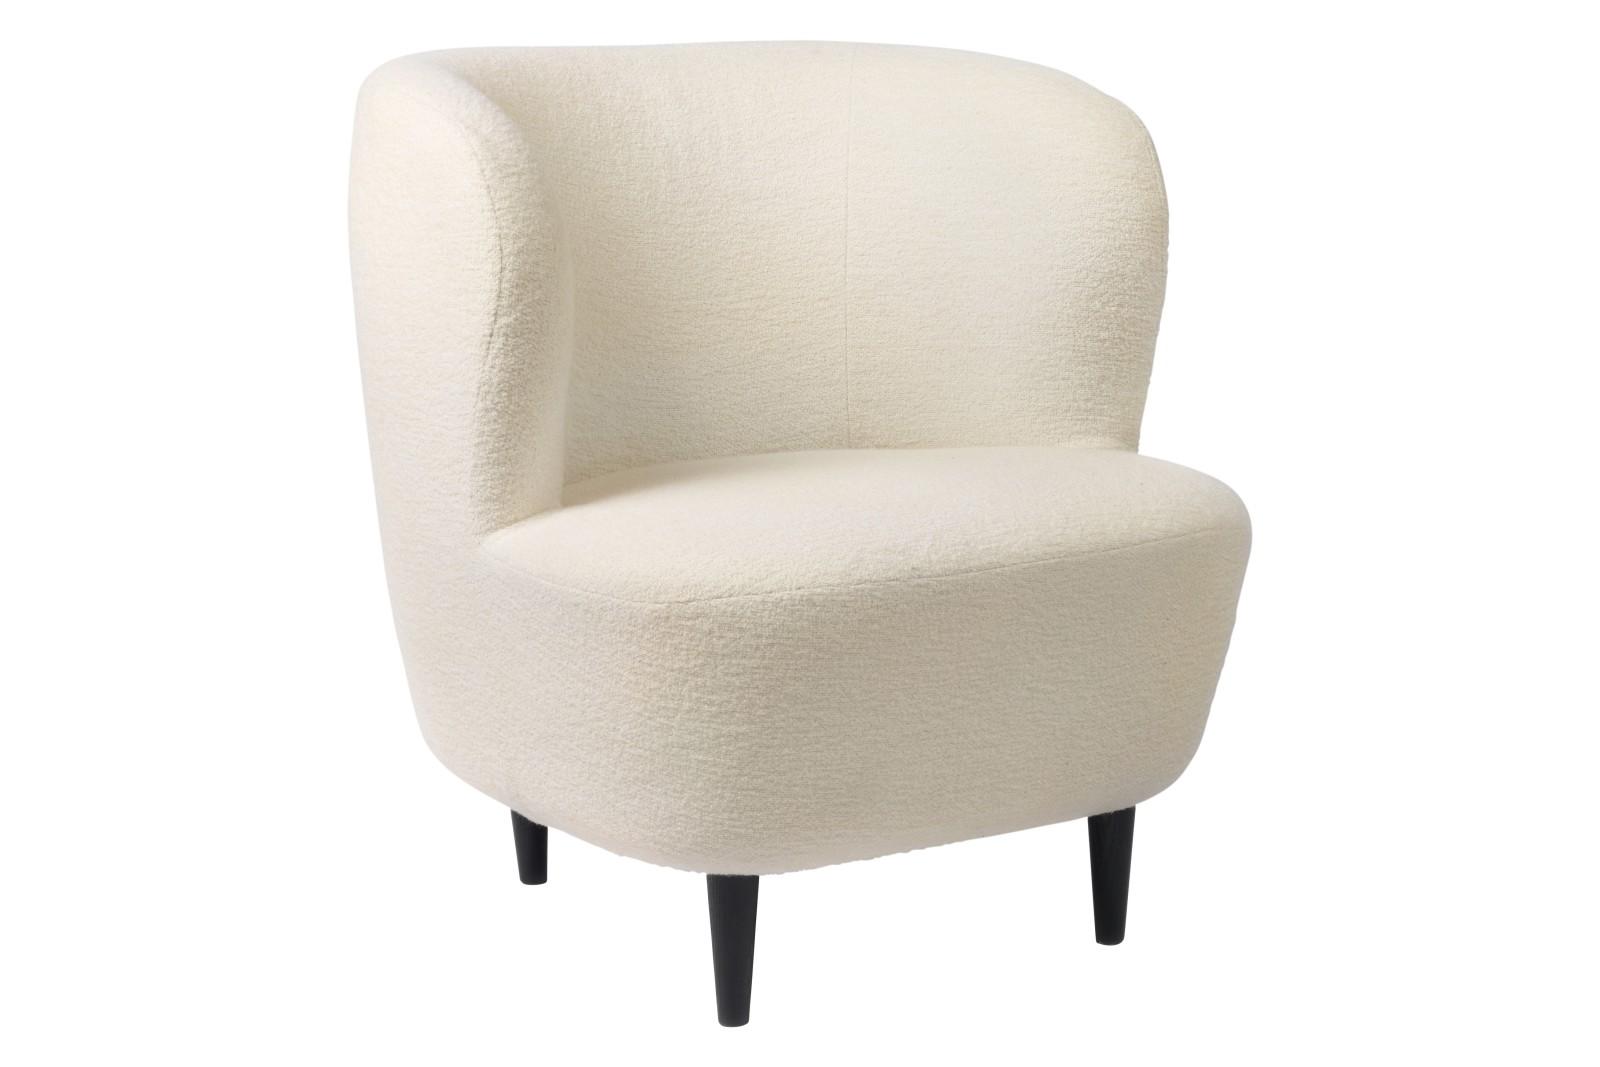 Stay Lounge Chair - Small, Wood base Gubi Wood American Walnut, Price Grp. 01